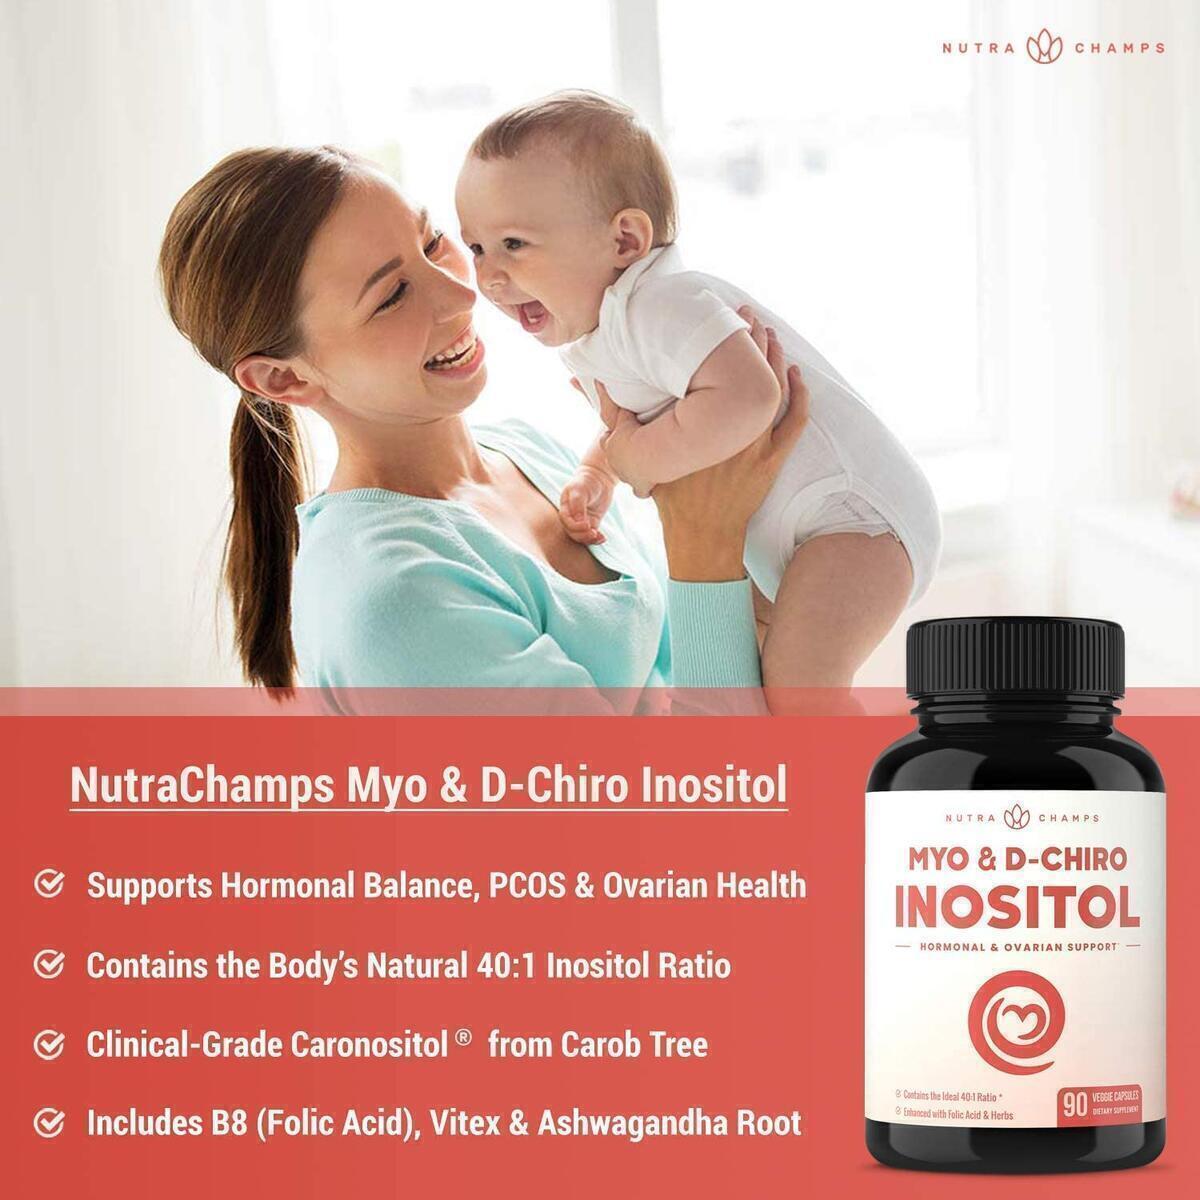 Myo-Inositol & D-Chiro Inositol Supplement [Natural 40:1 Ratio] B8 Powder Enhanced with Vitex & Folic Acid | Ovarian & PCOS Support + Fertility & Hormone Balance for Women & Men | 90 Vegan Capsules